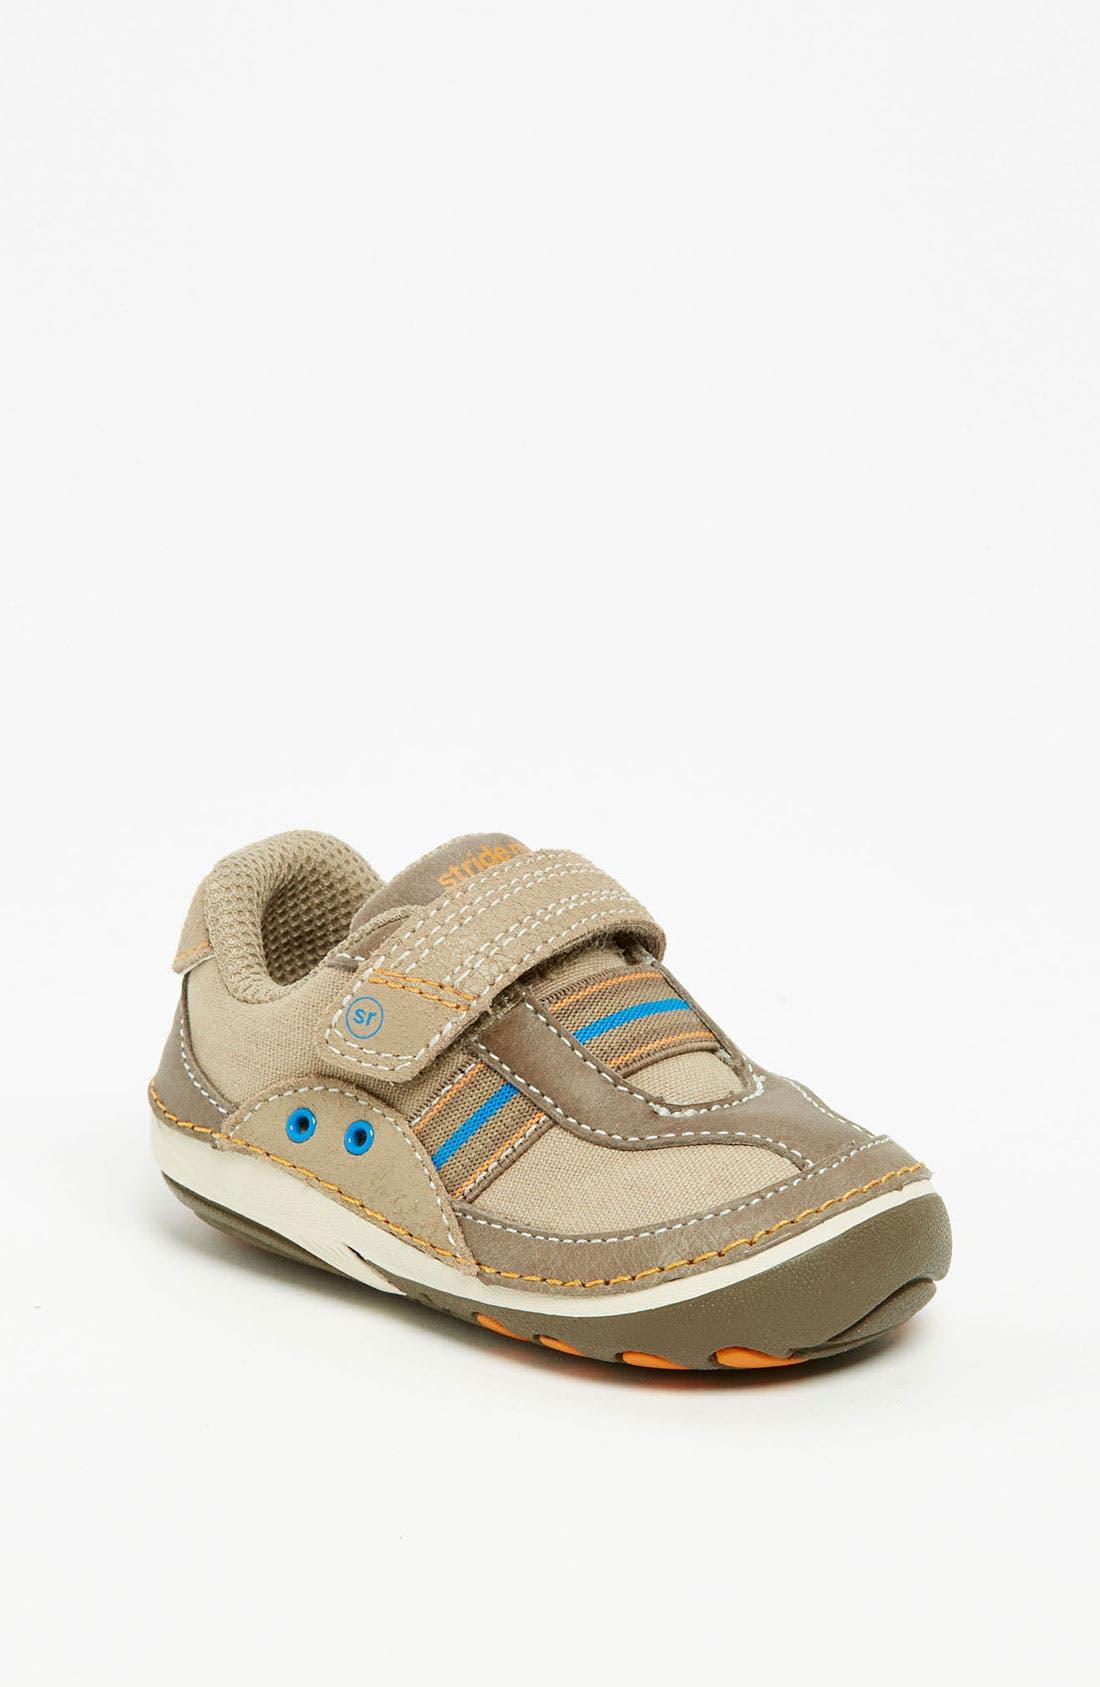 Alternate Image 1 Selected - Stride Rite 'Dalton' Sneaker (Baby & Walker)